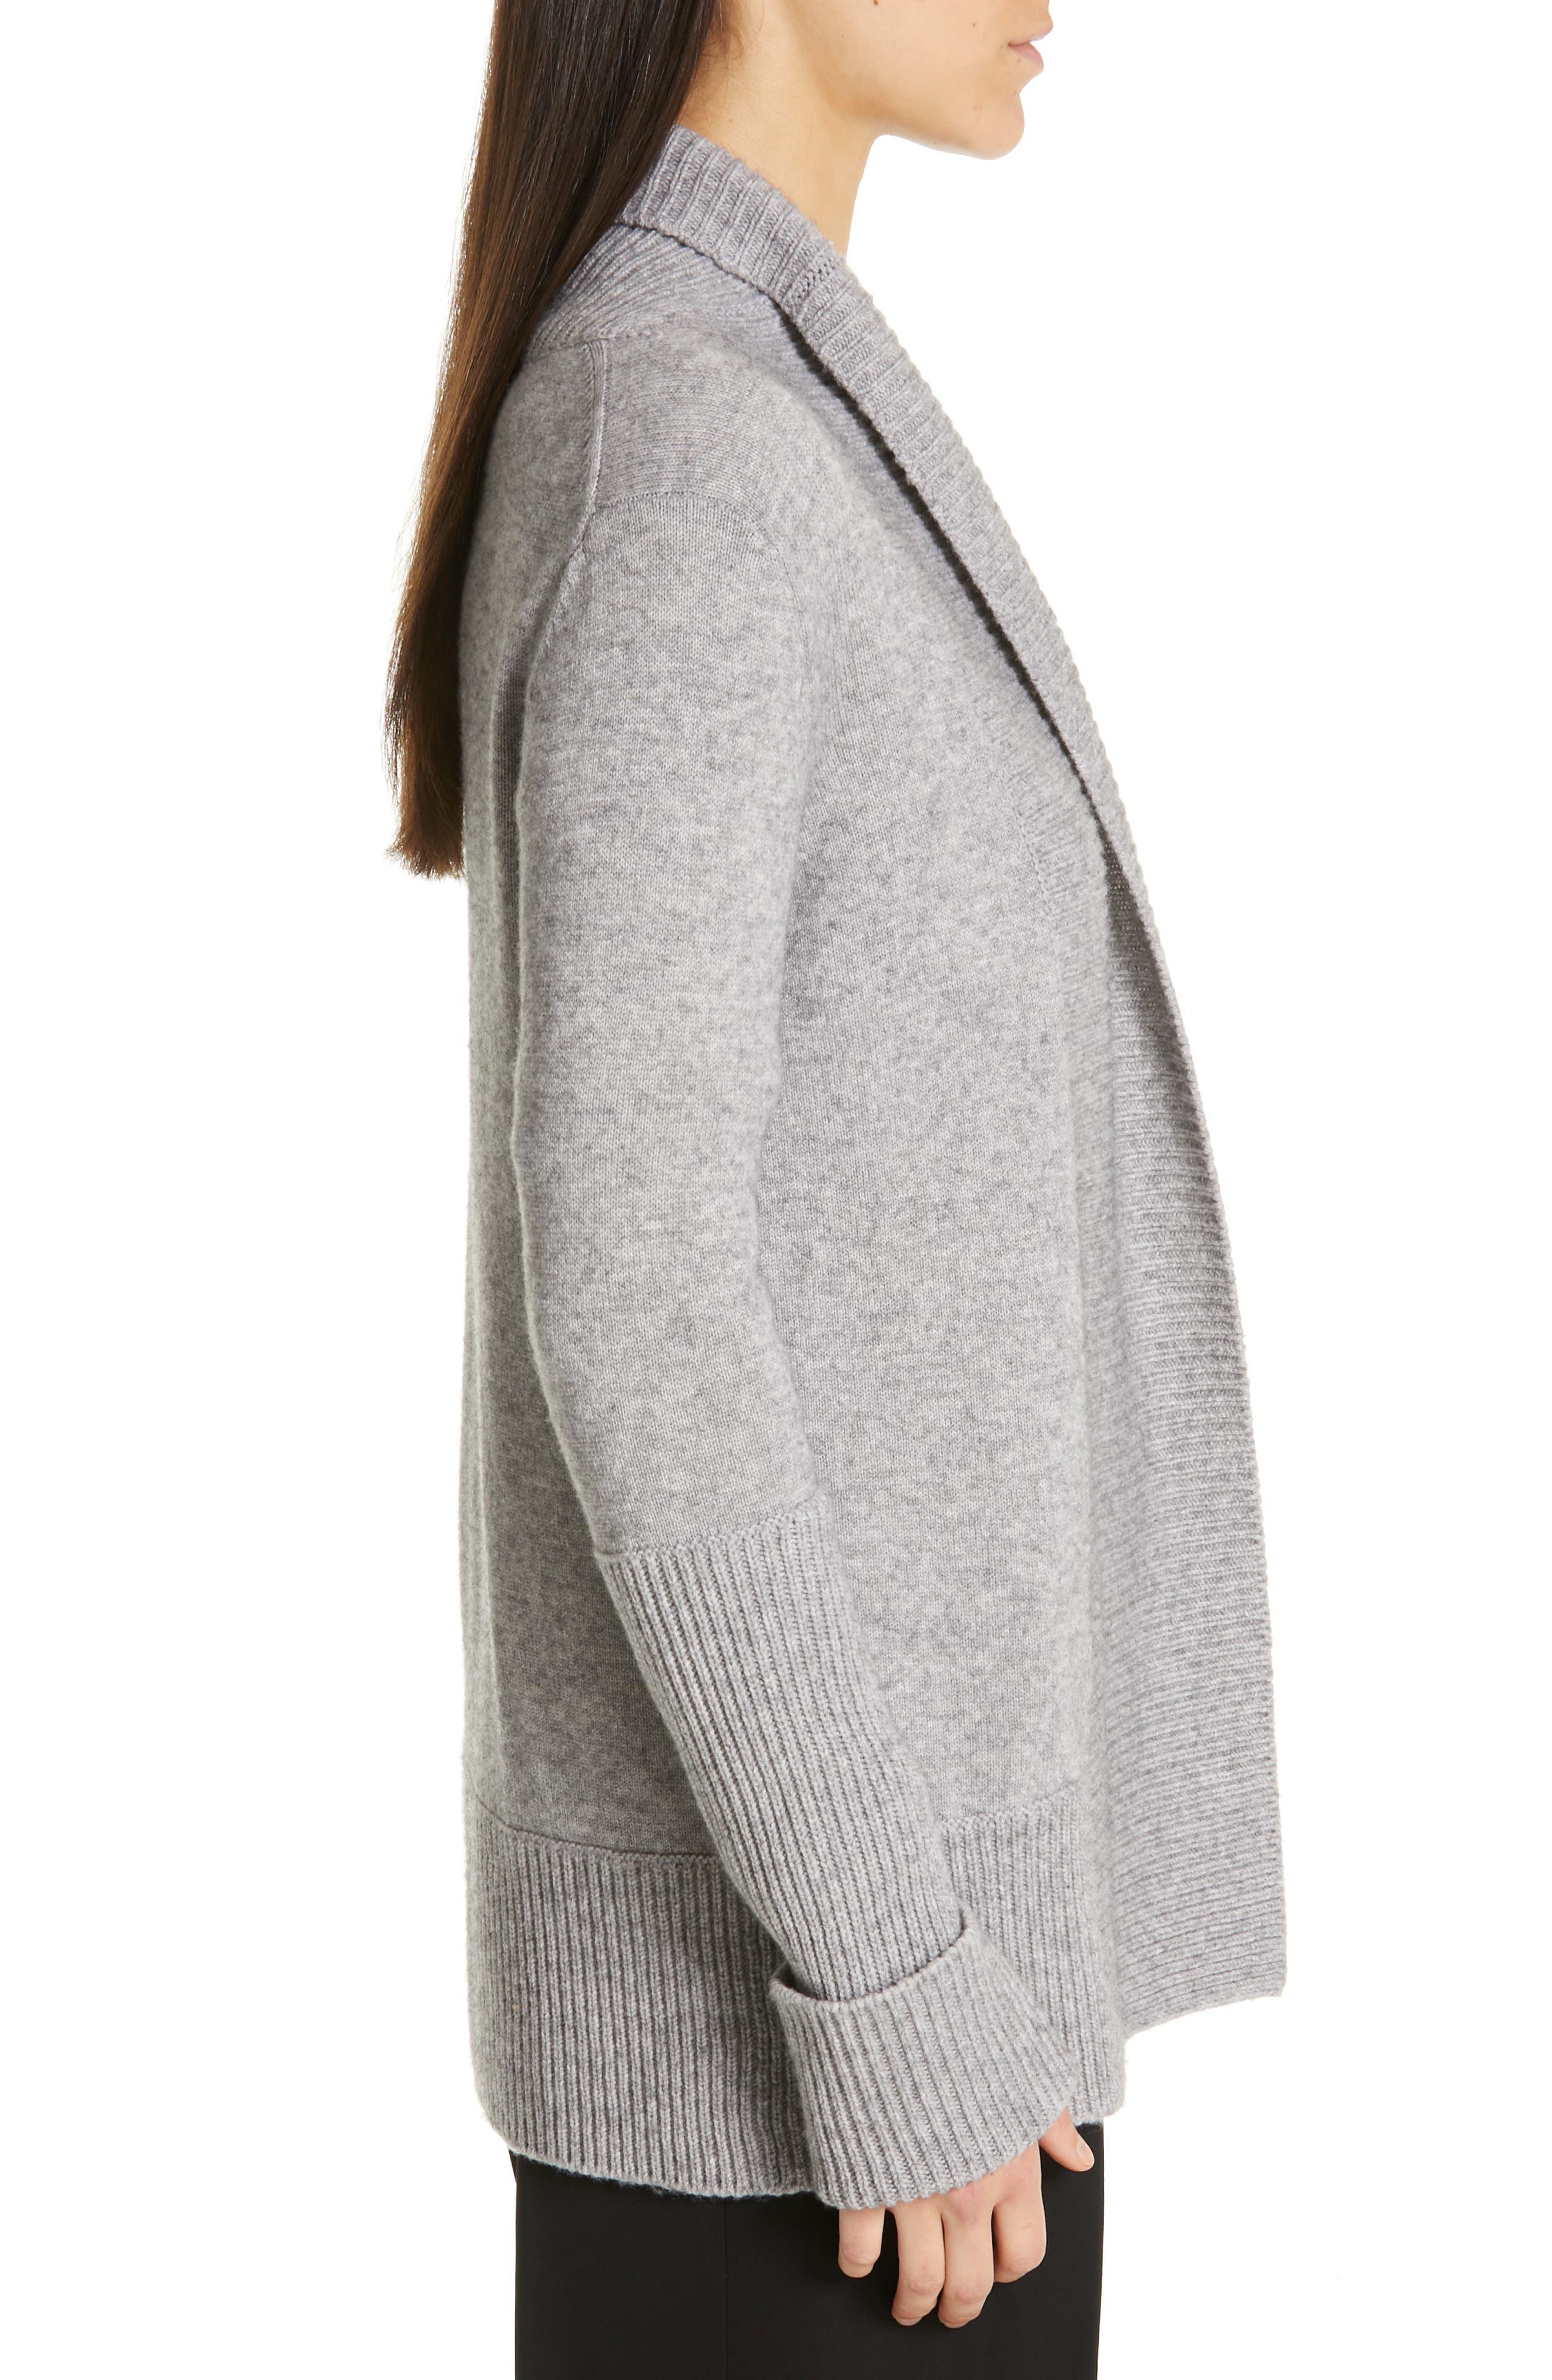 VINCE, Wool & Cashmere Cardigan, Alternate thumbnail 3, color, H STEEL